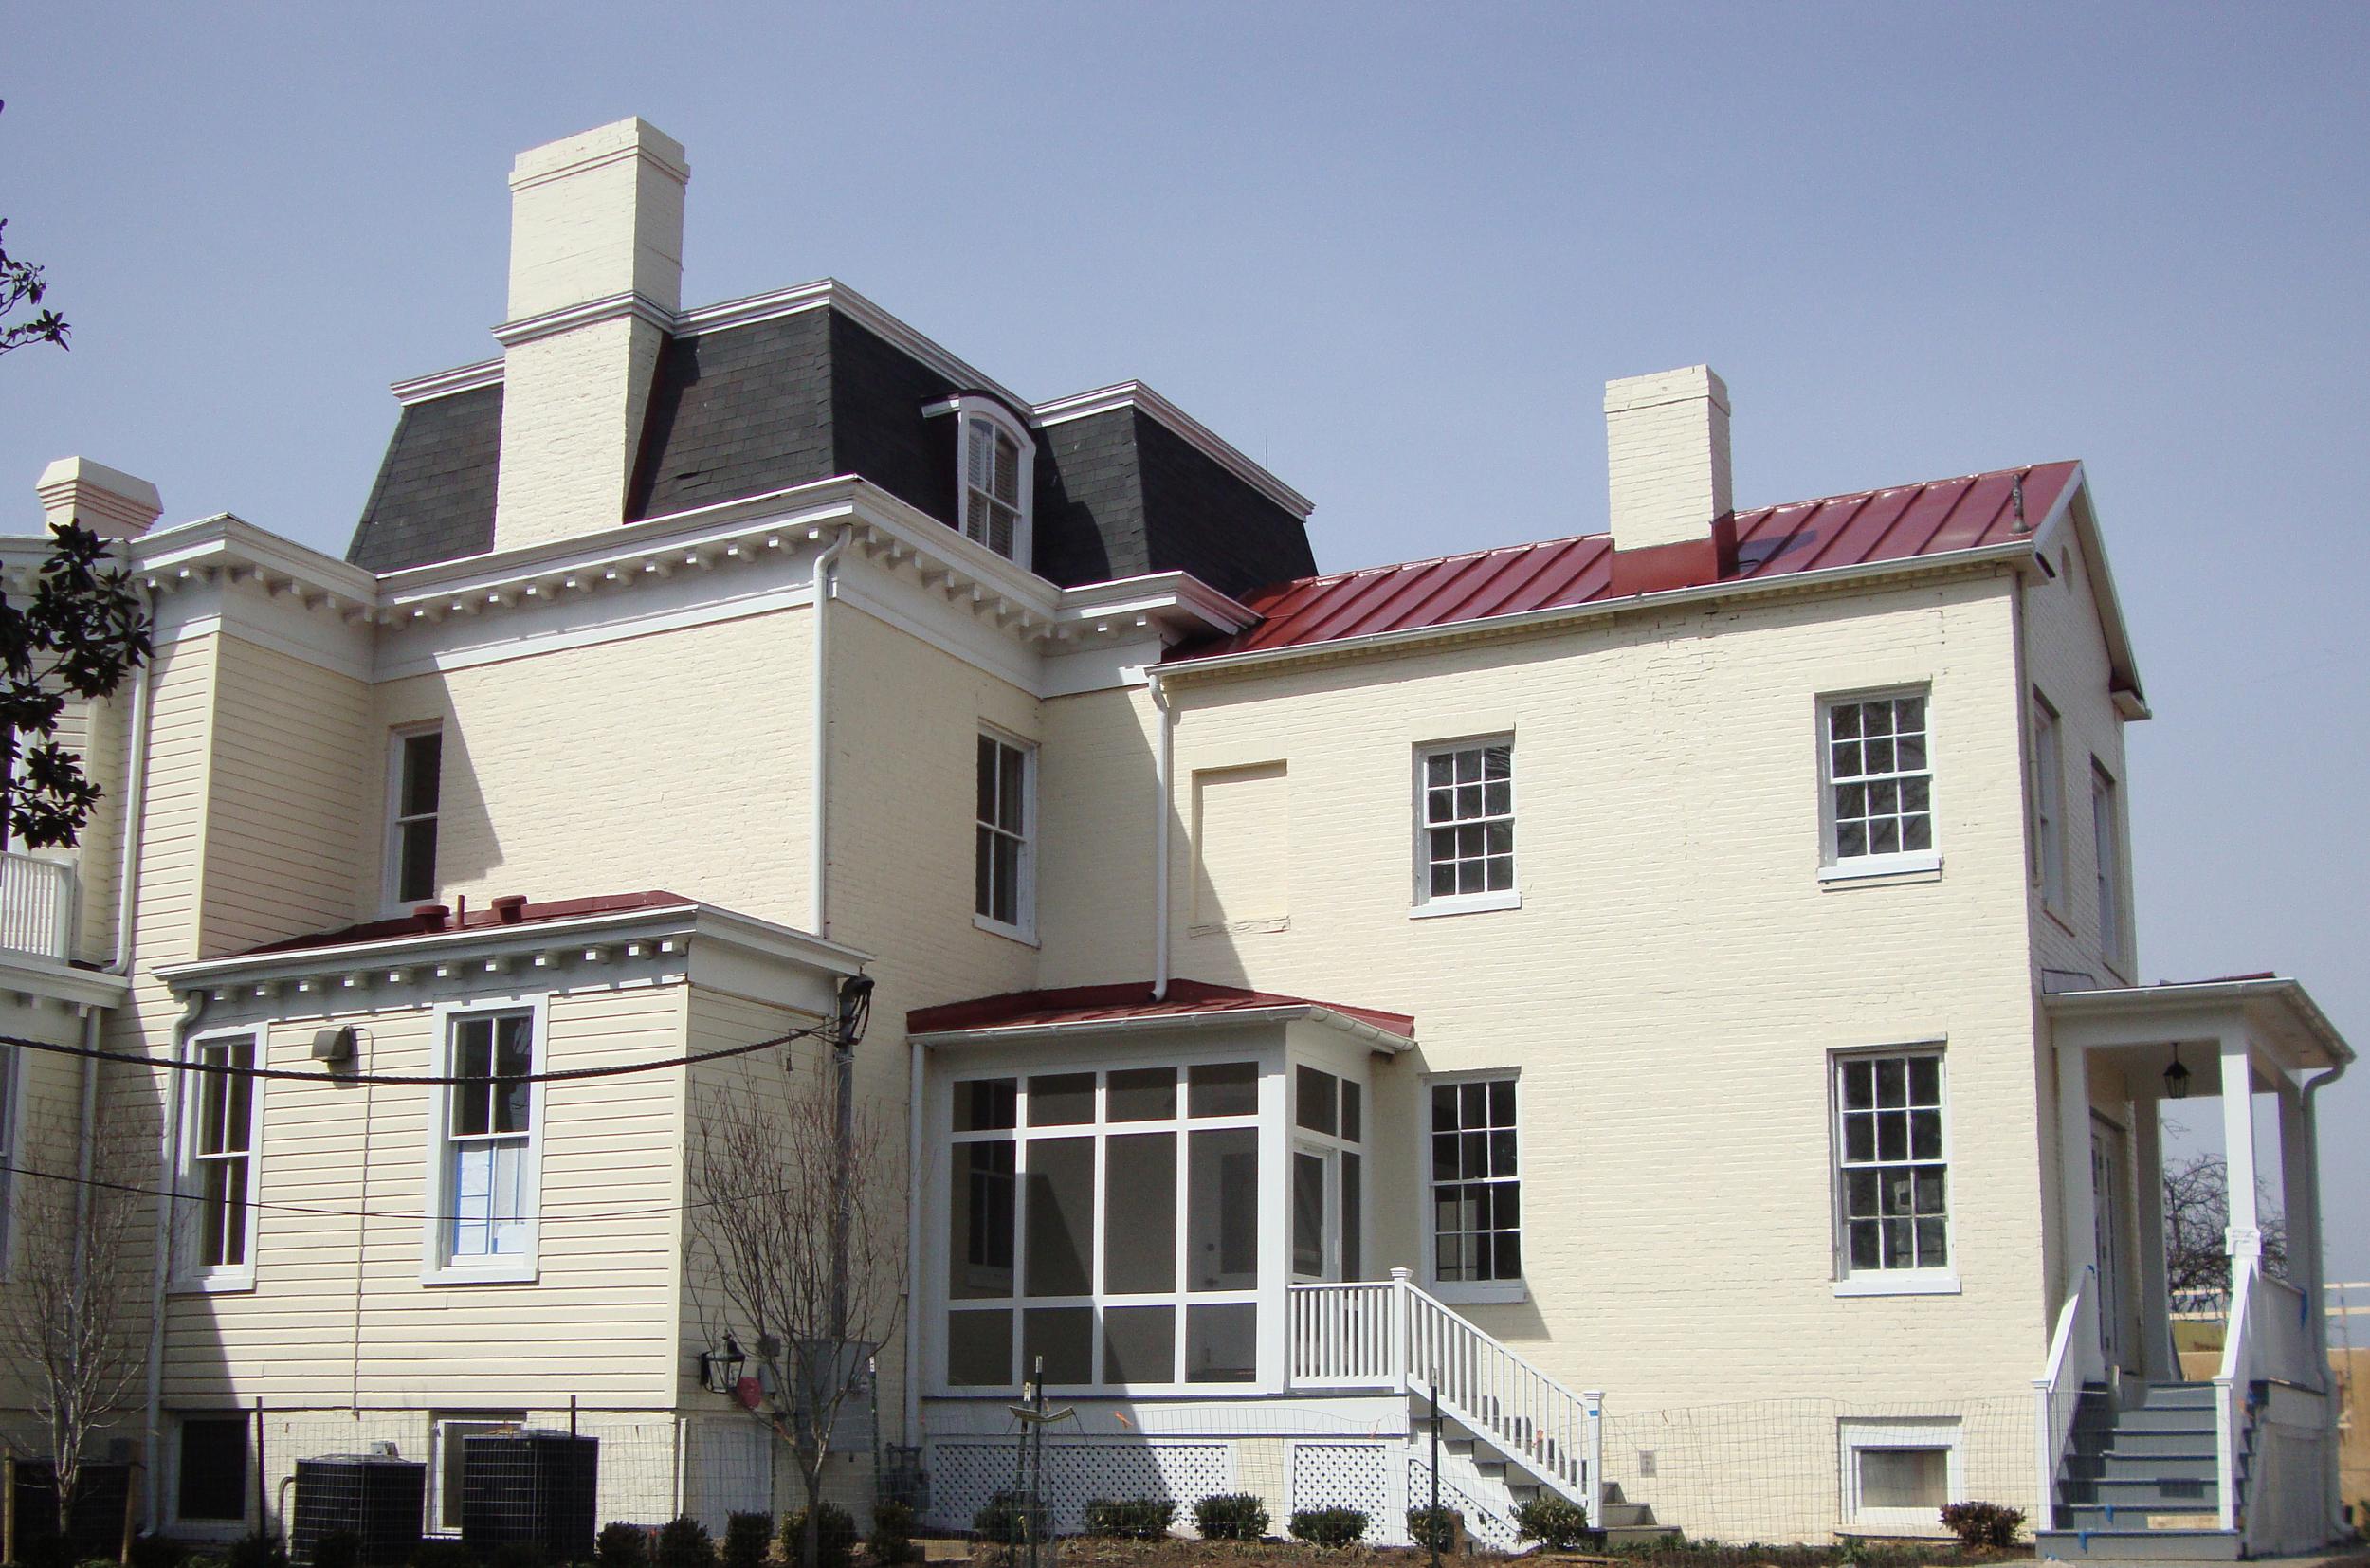 Riggs Thompson House